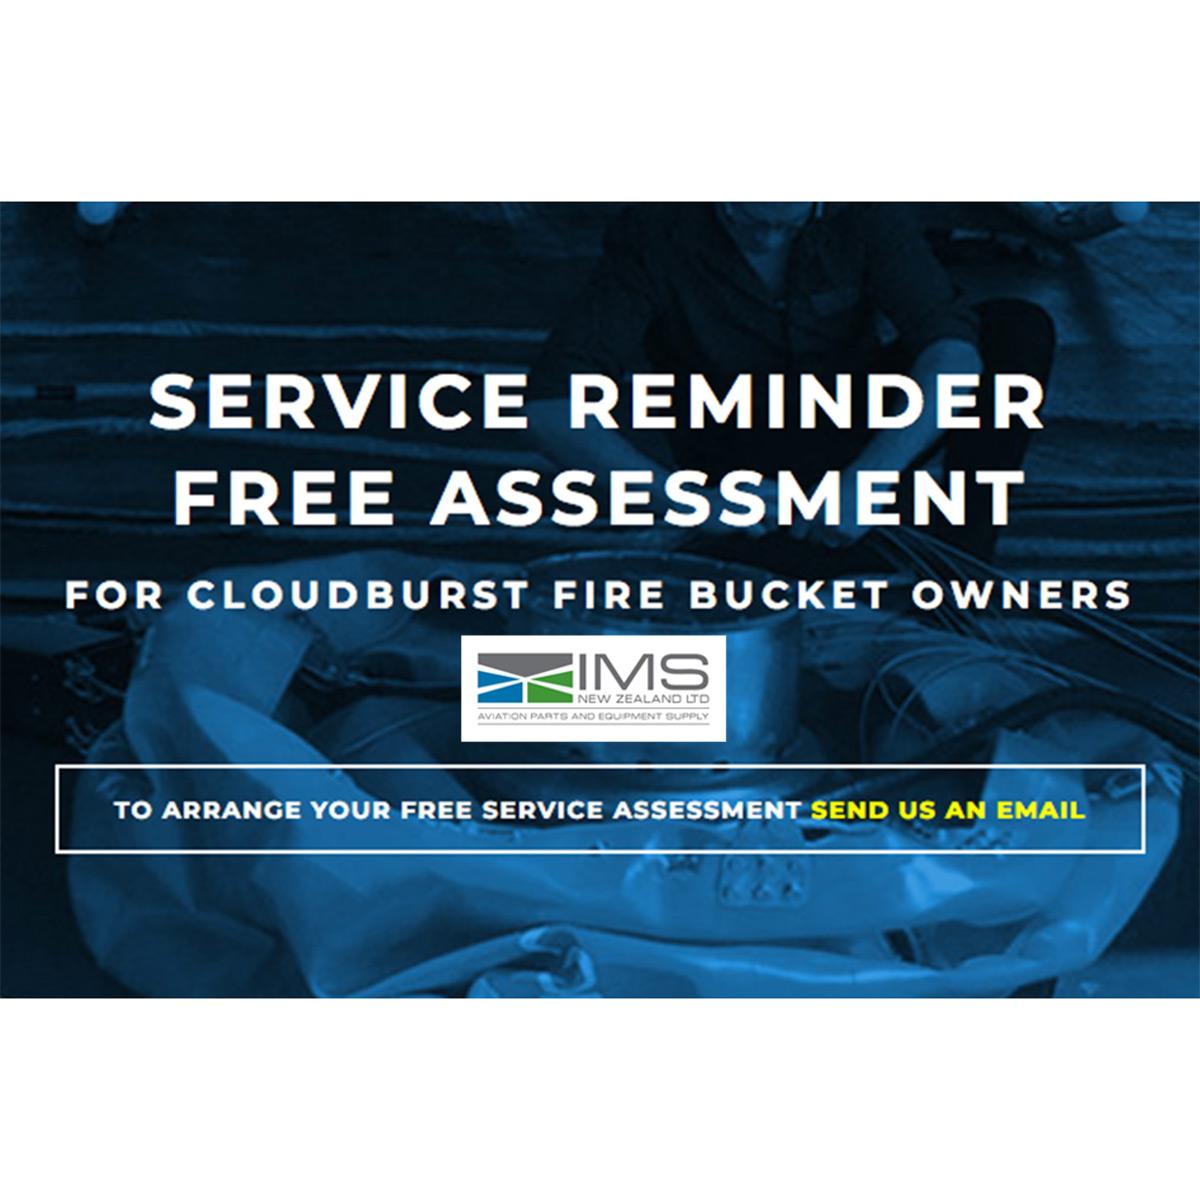 Cloudburst Service Reminder Free Assessment